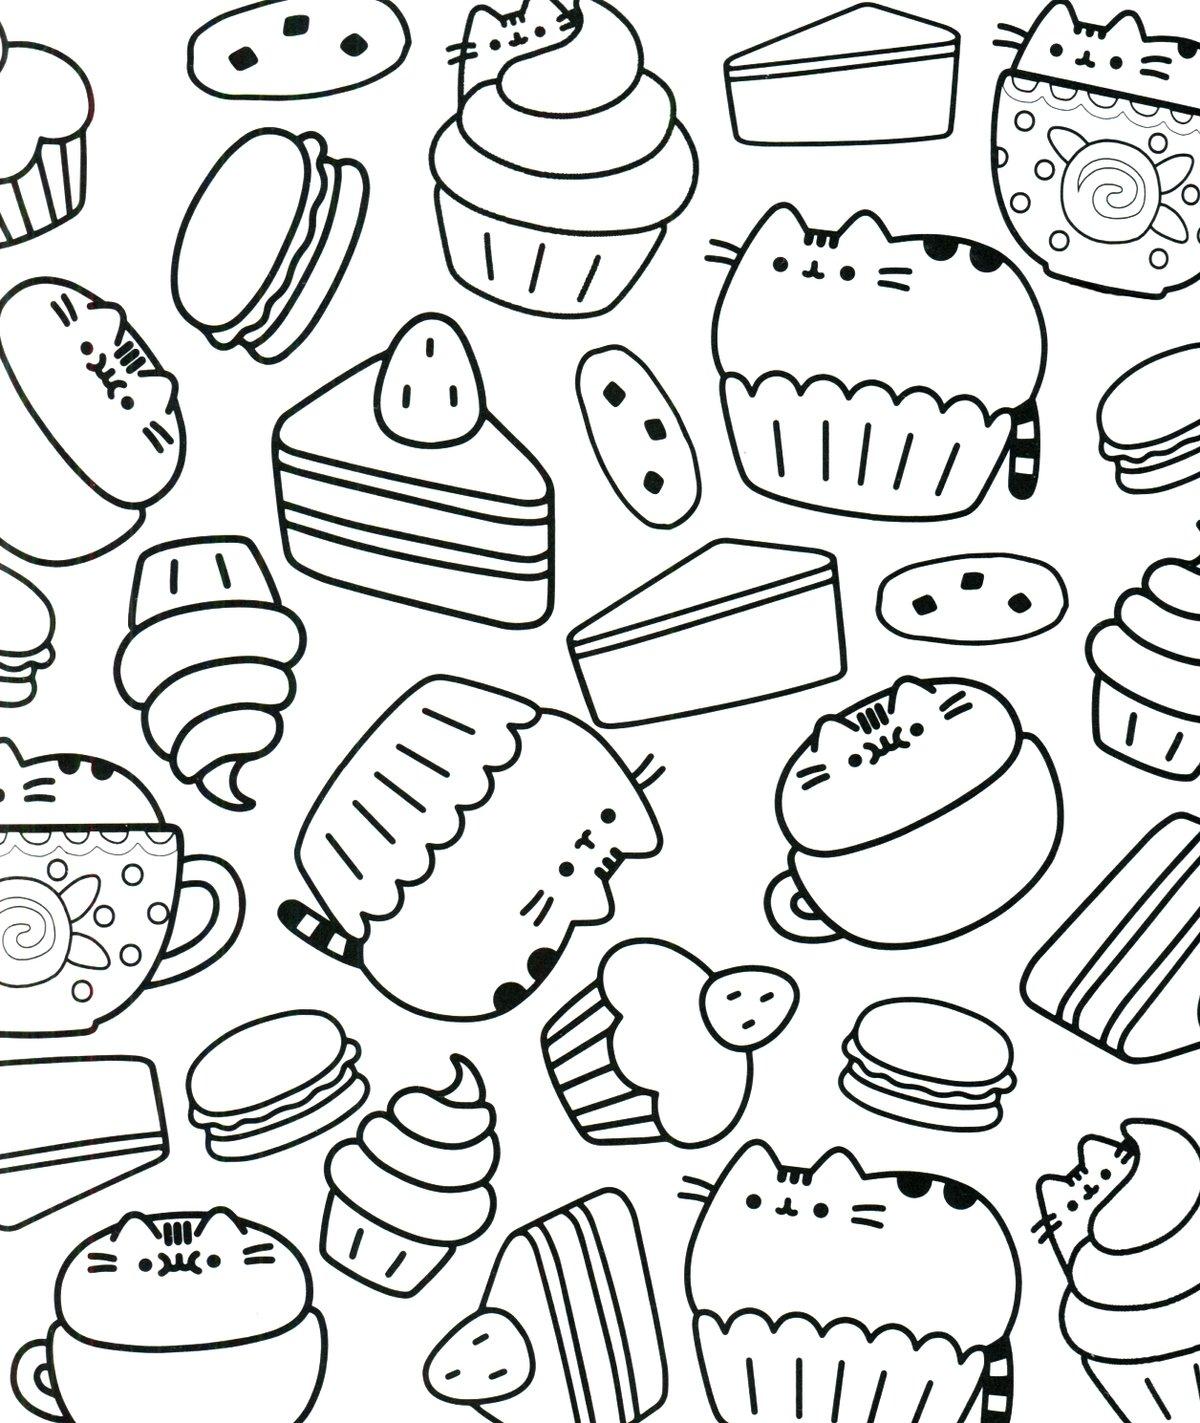 summary korean food coloring page free printable coloring pages Korean Noodles korean food coloring page free printable coloring pages hd 1200 1423